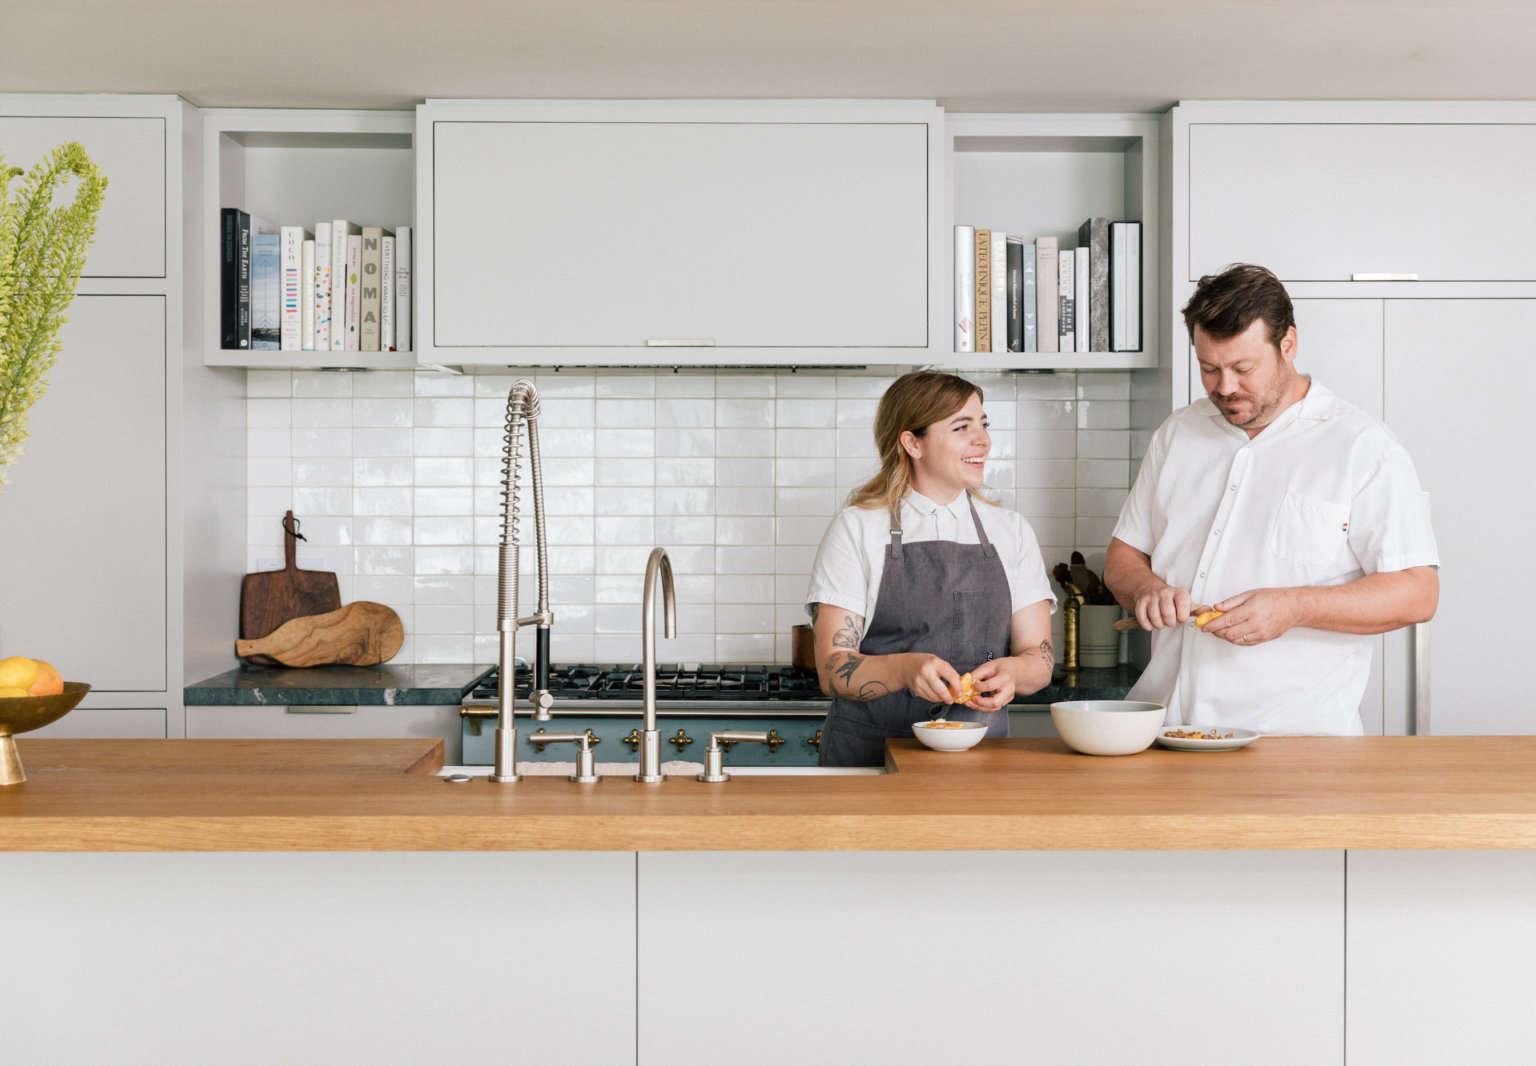 elske apartment david and anna in kitchen carolina mariana rodriguez